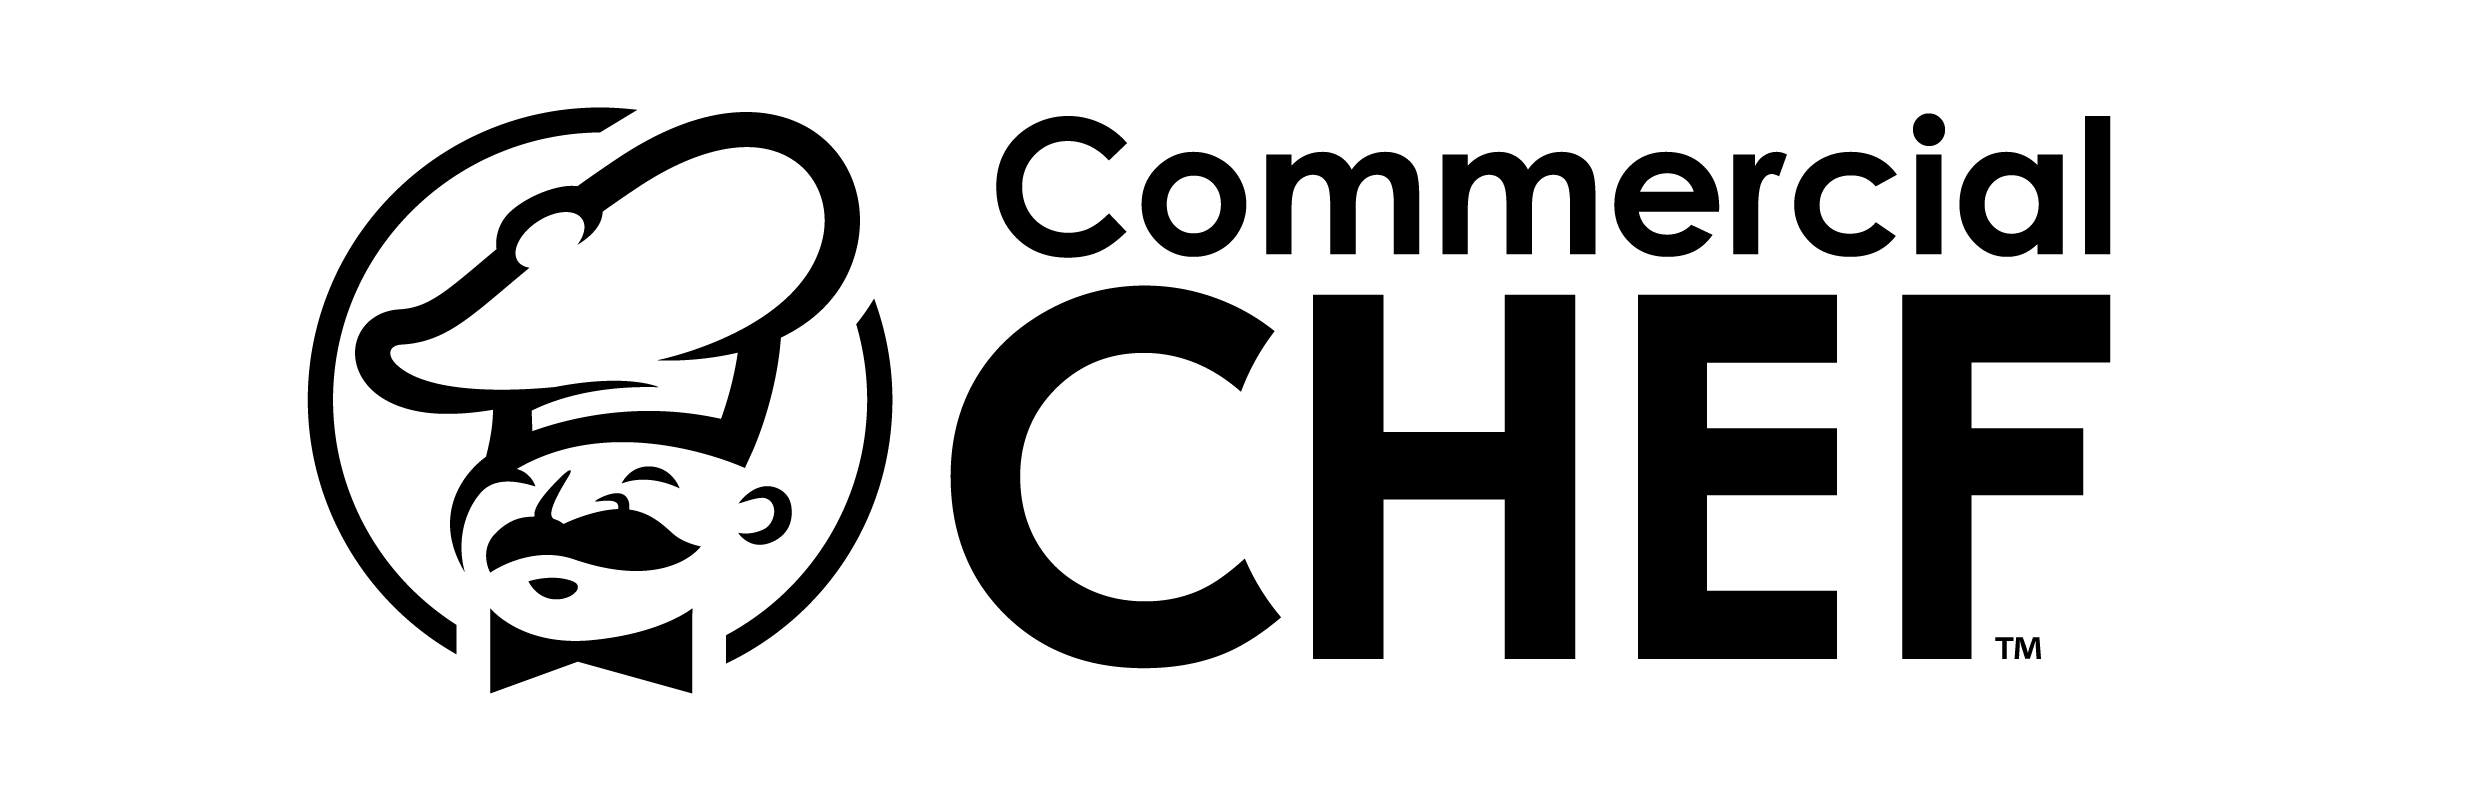 COMMERCIALCHEF_K.png